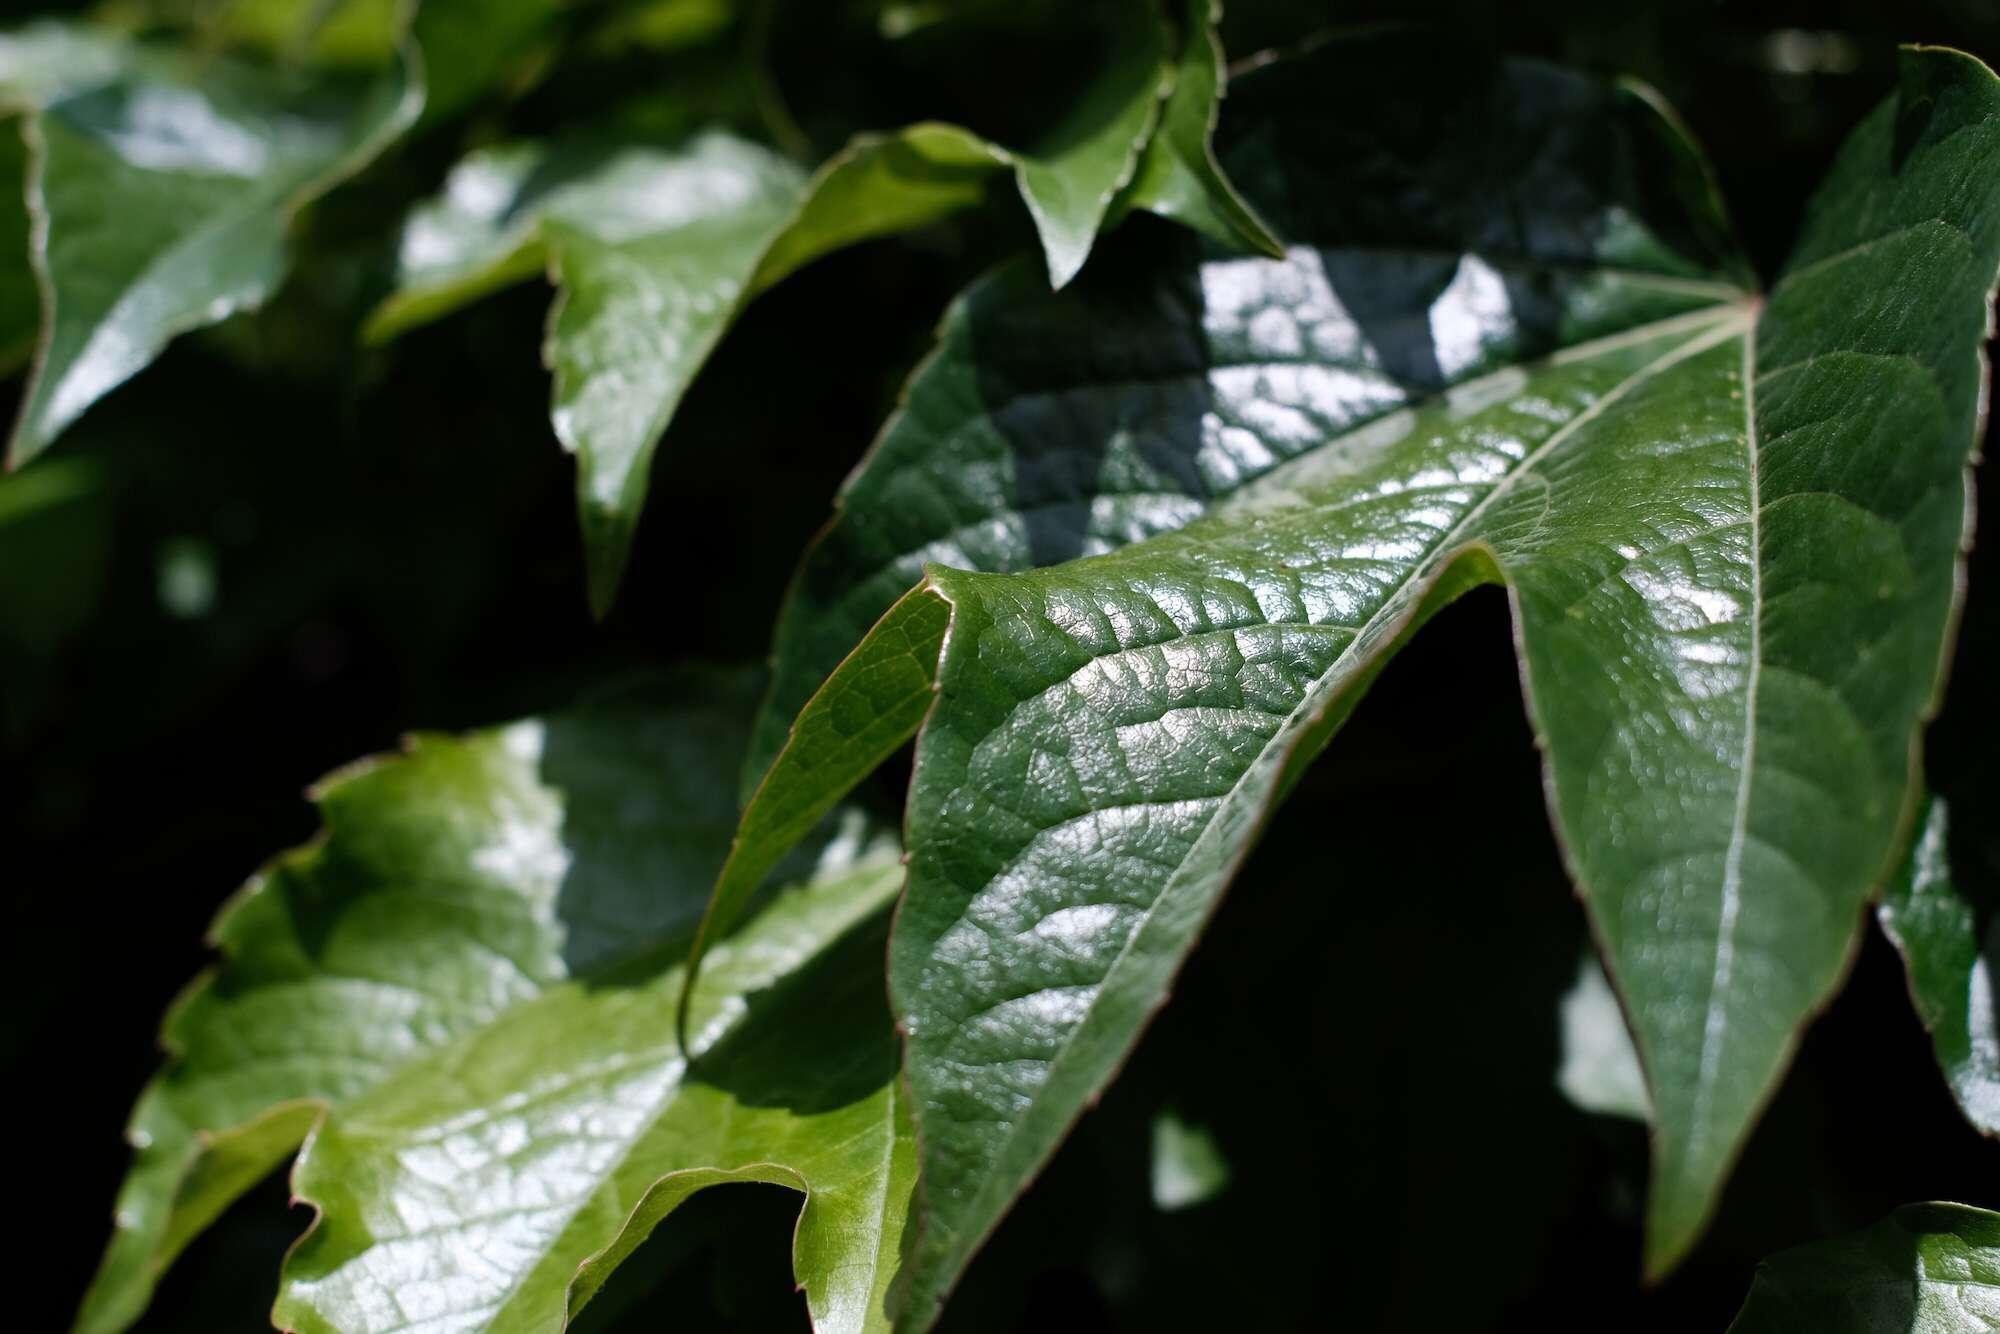 Leaves captured on camera using TTArtisan's APS-C 35mm F1.4 lens